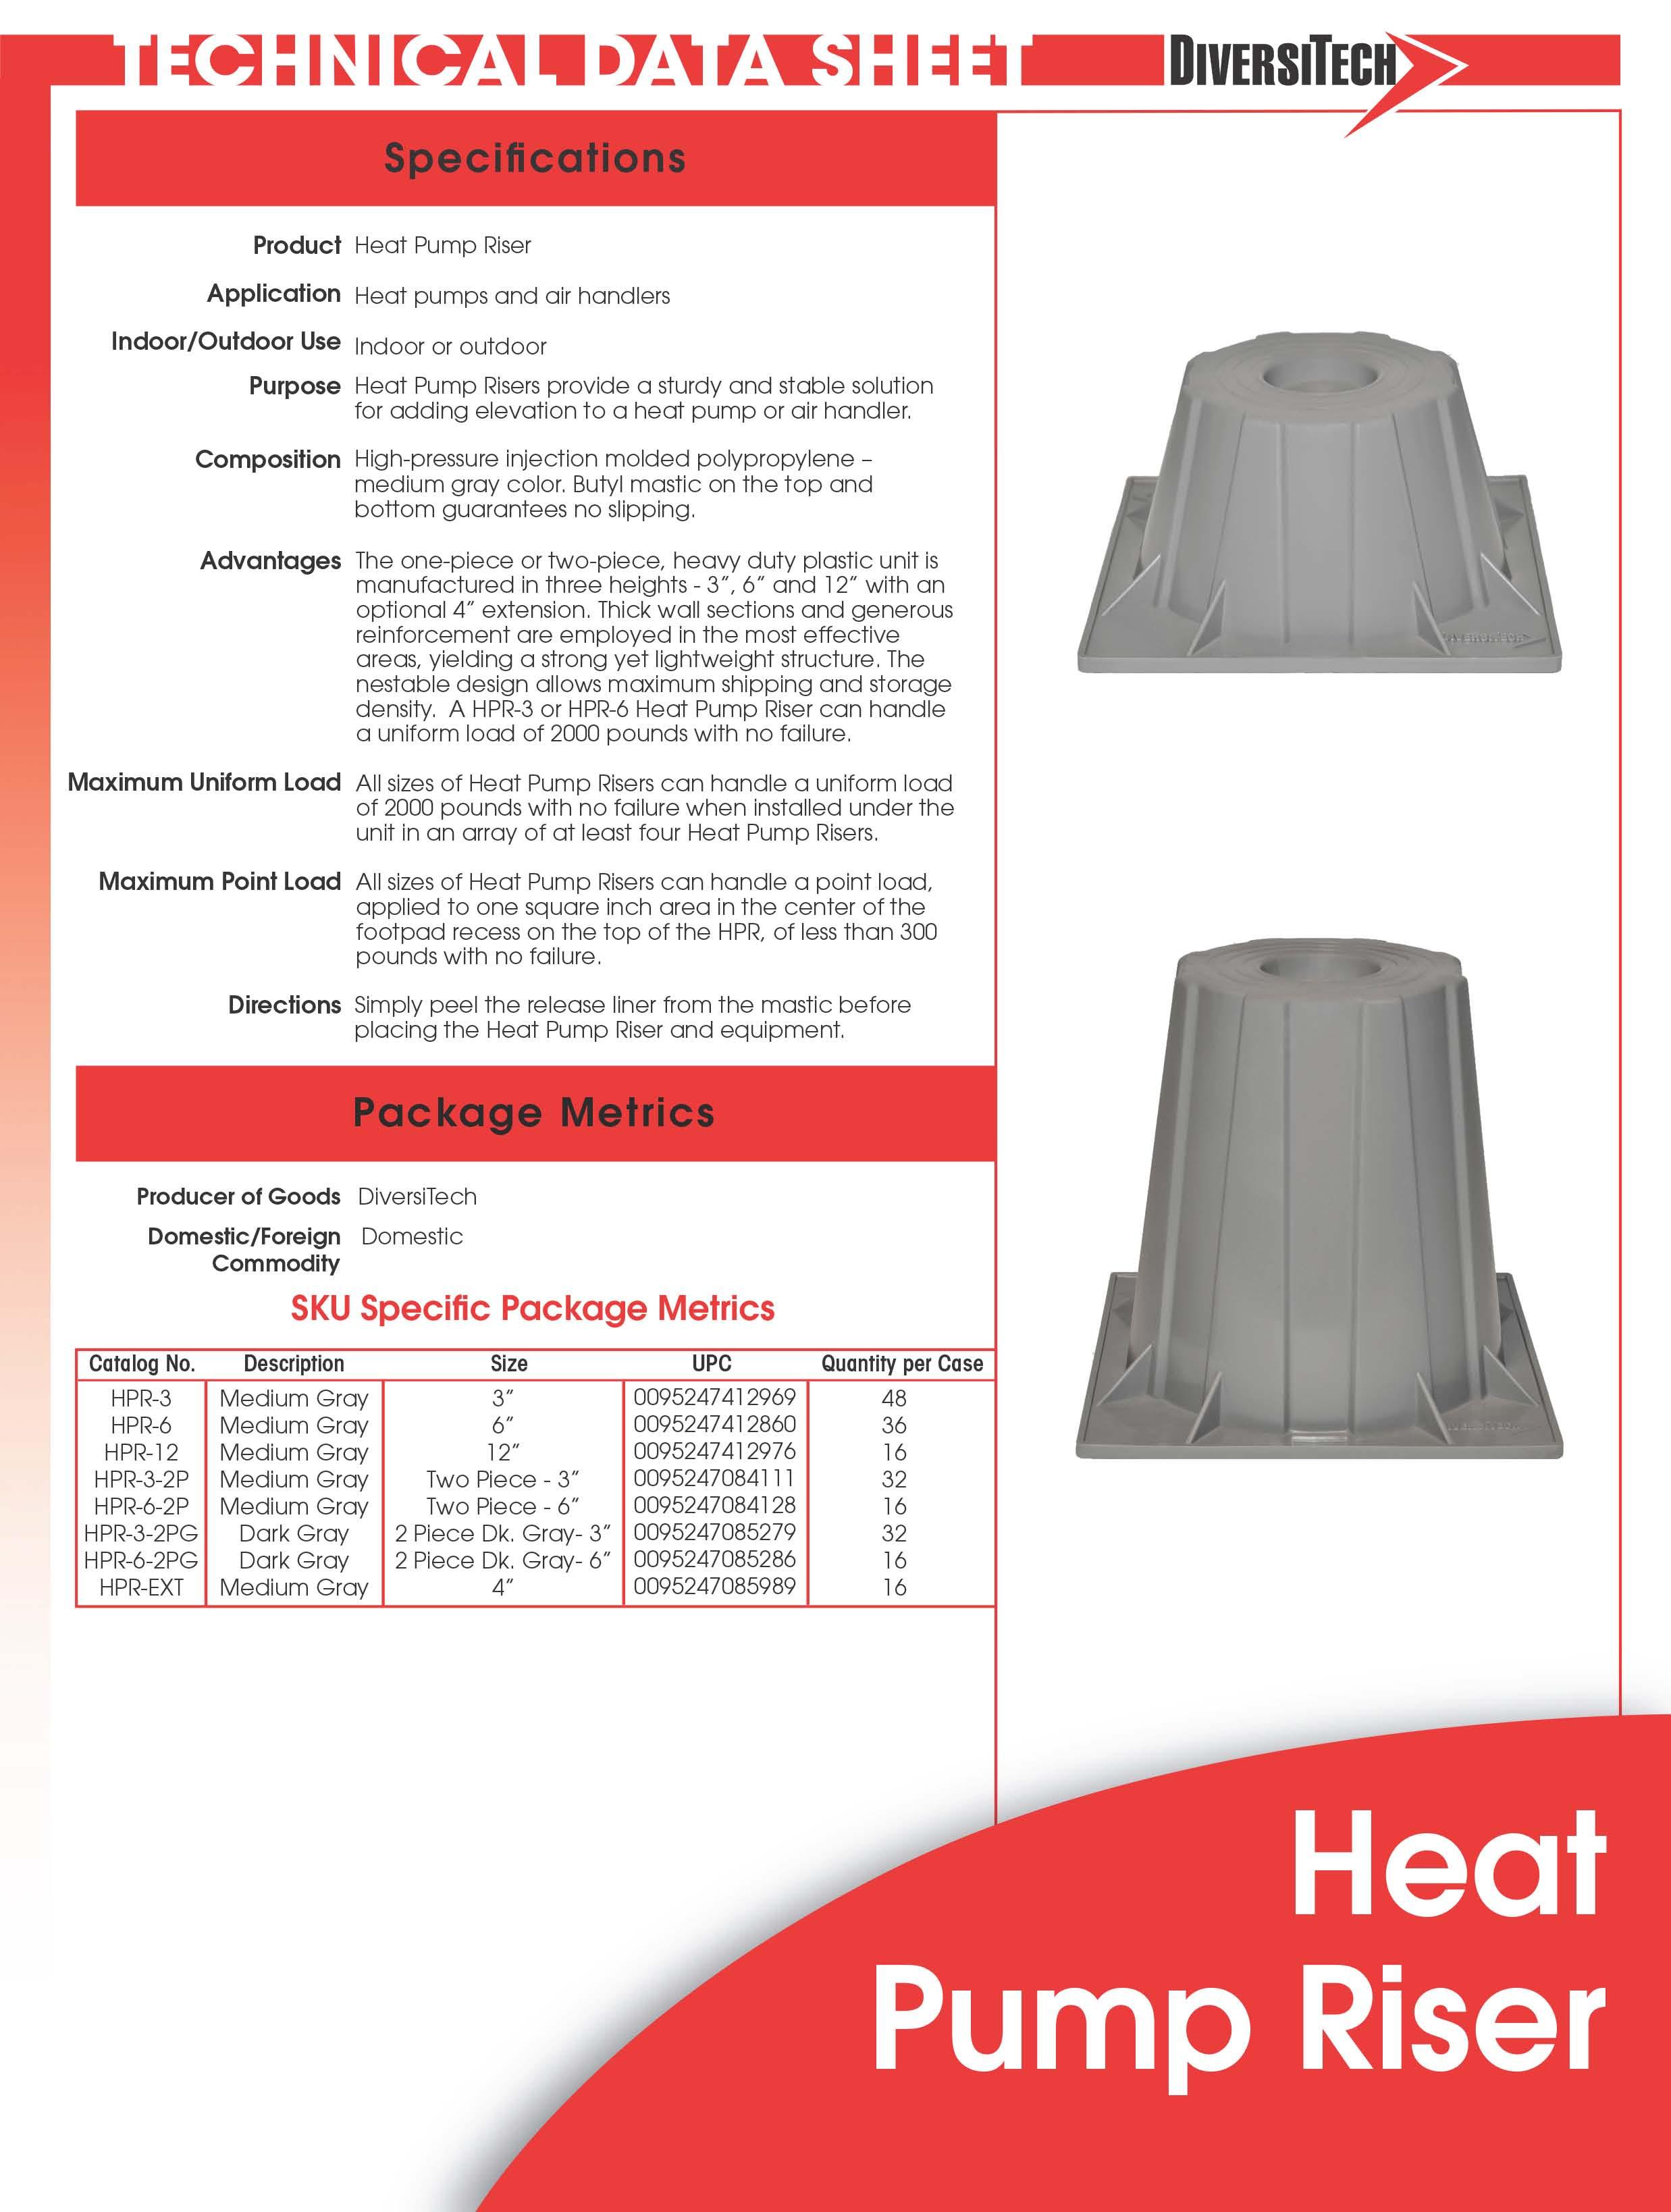 6 Quot Condenser Heat Pump Riser Elevator Stands Hpr 6 4 Pack